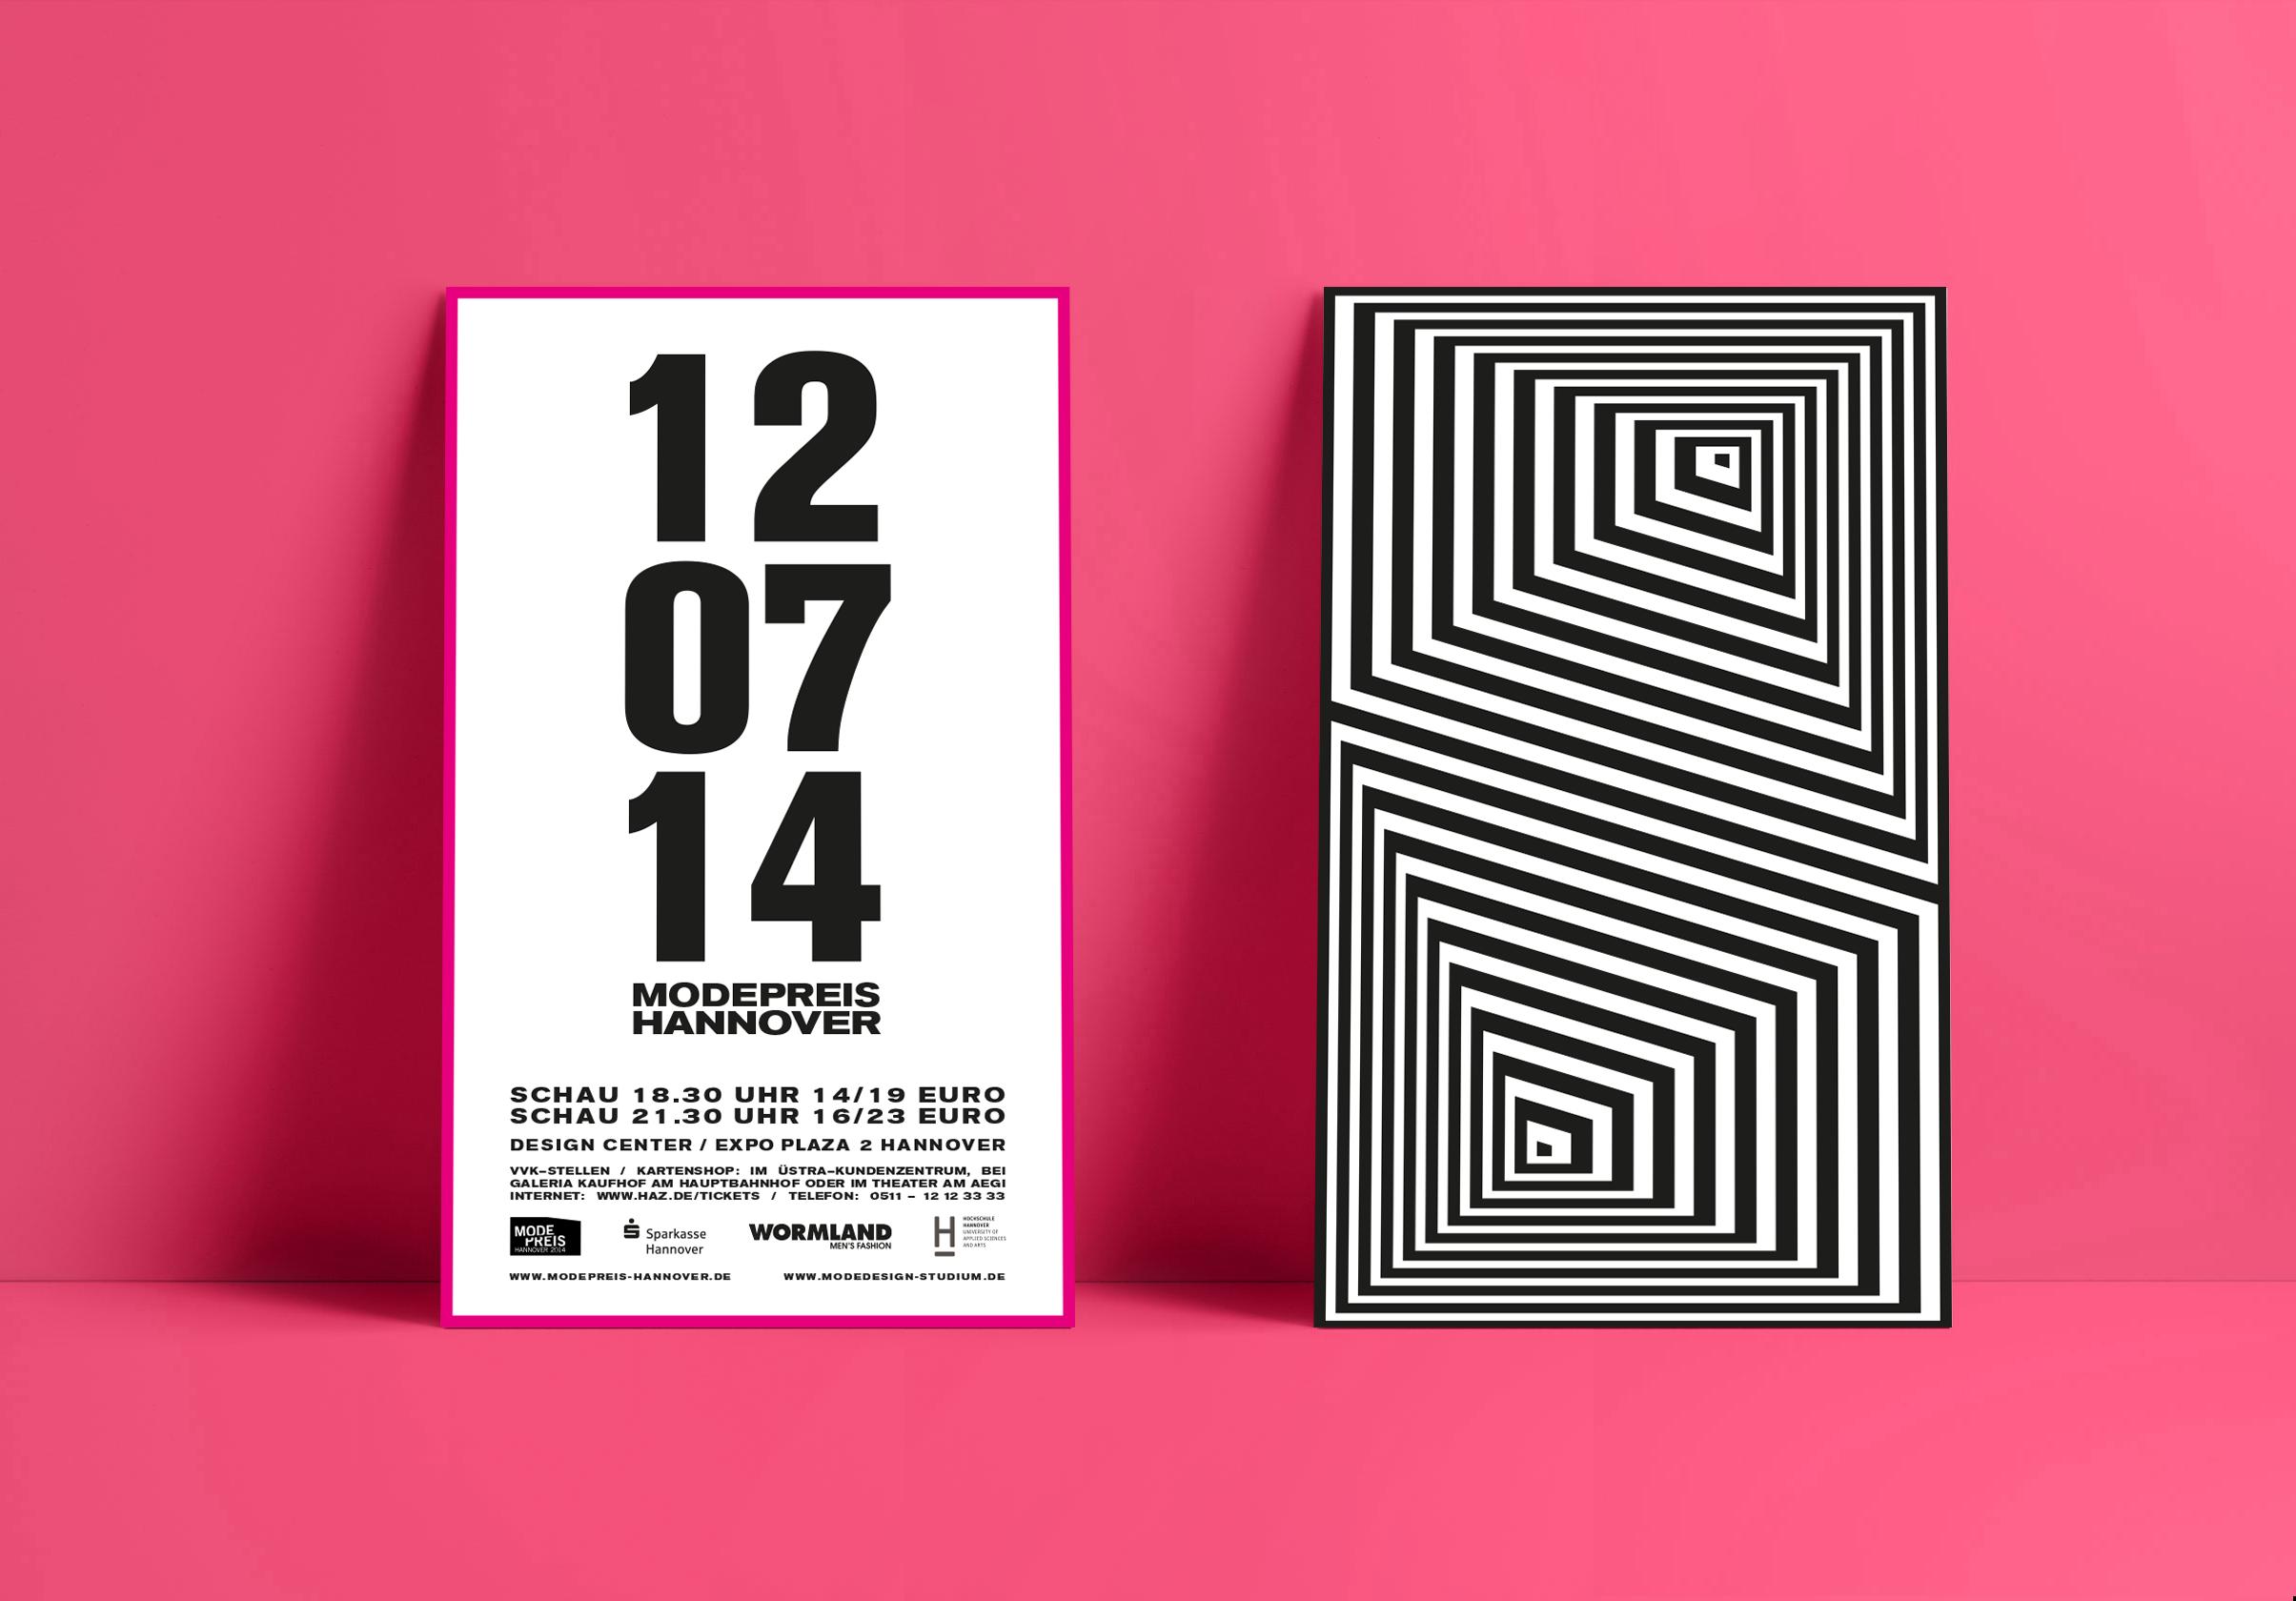 Corporate Design, Brandig, Event Design, Modepreis Hannover Poster | Freelancer Grafik Design Berlin